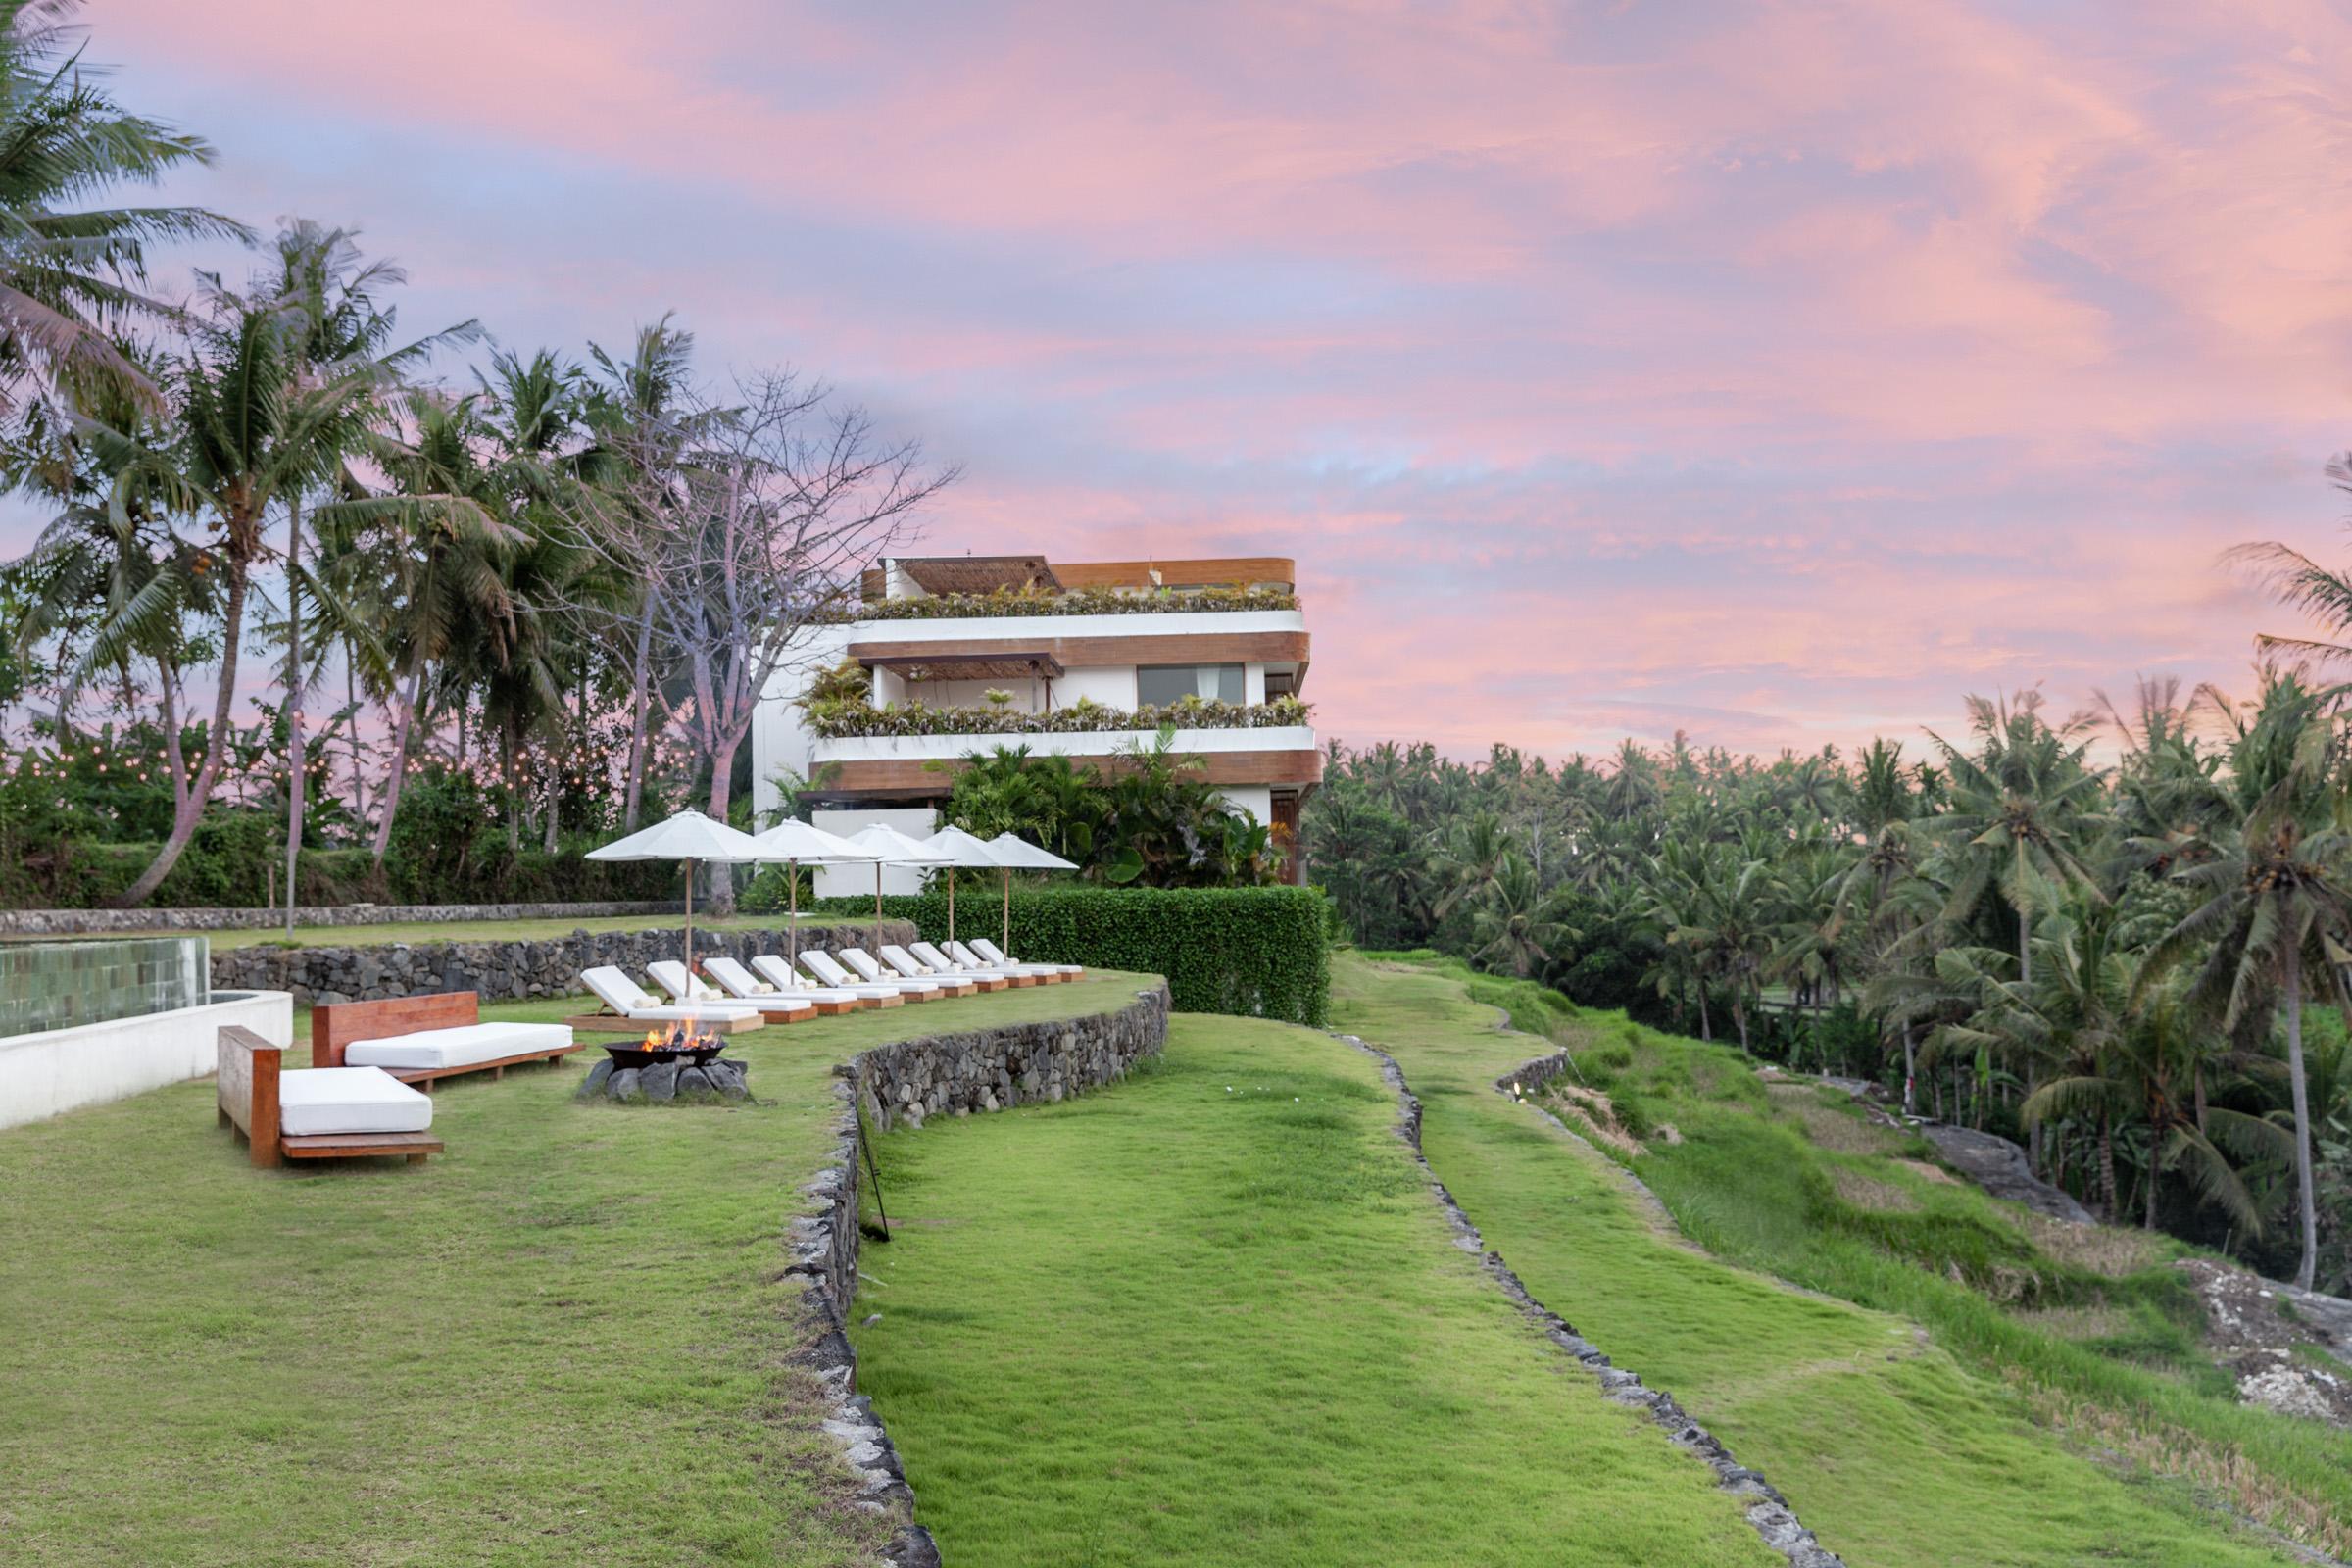 Soulshhine, Ubud, Retreat, Hotel, Bali Interiors, My Shrine, Michael Franti, Sara Franti, Yoga